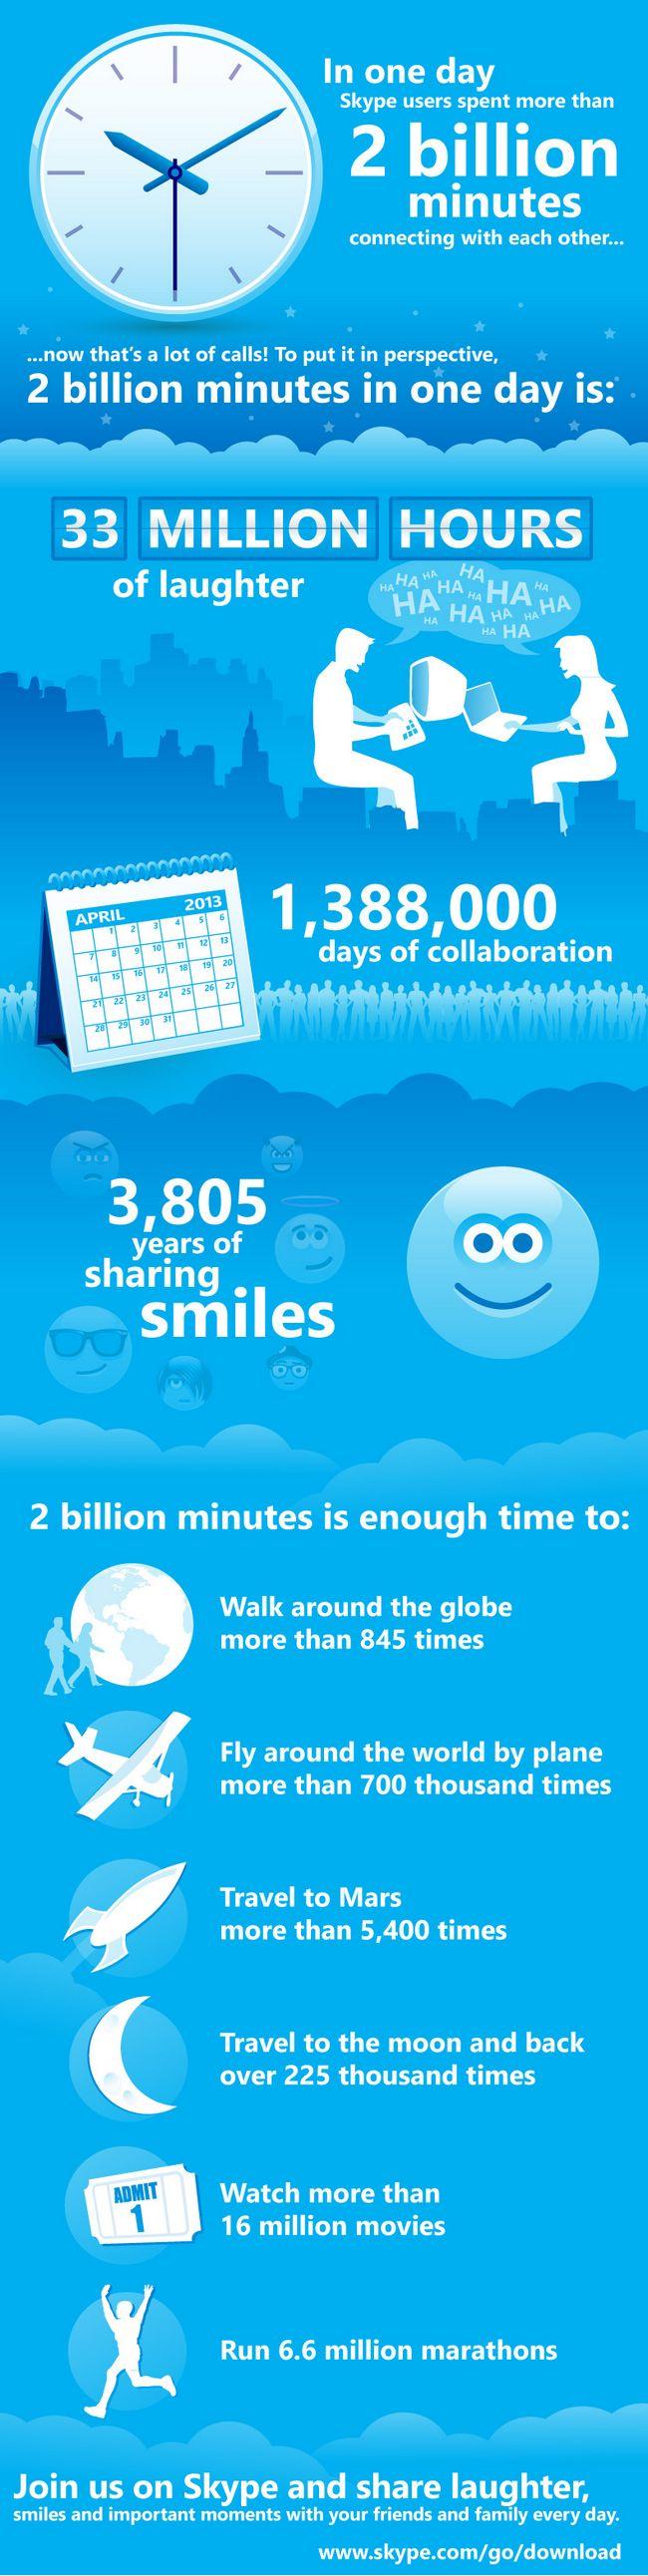 skype-statistics-4-2013